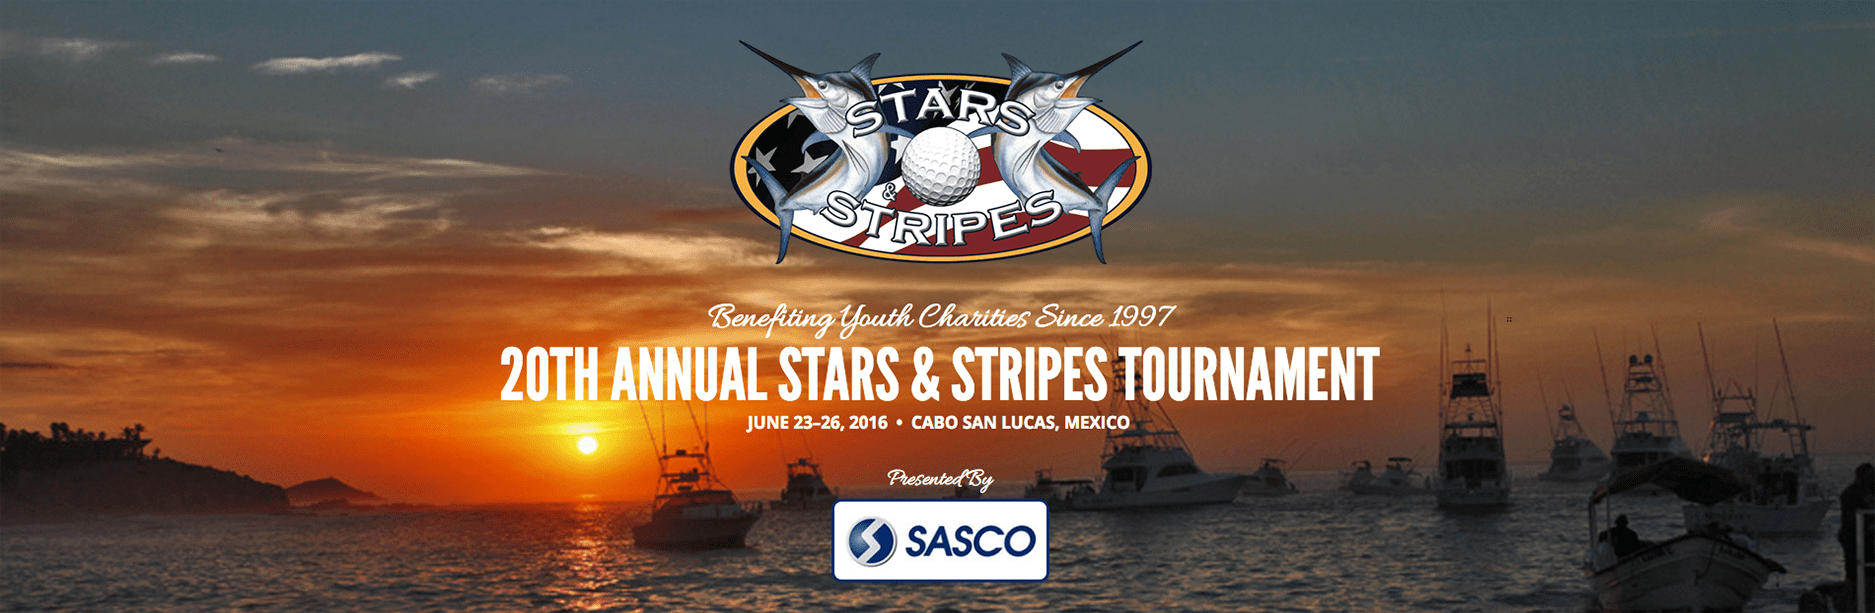 StarsStripes2016